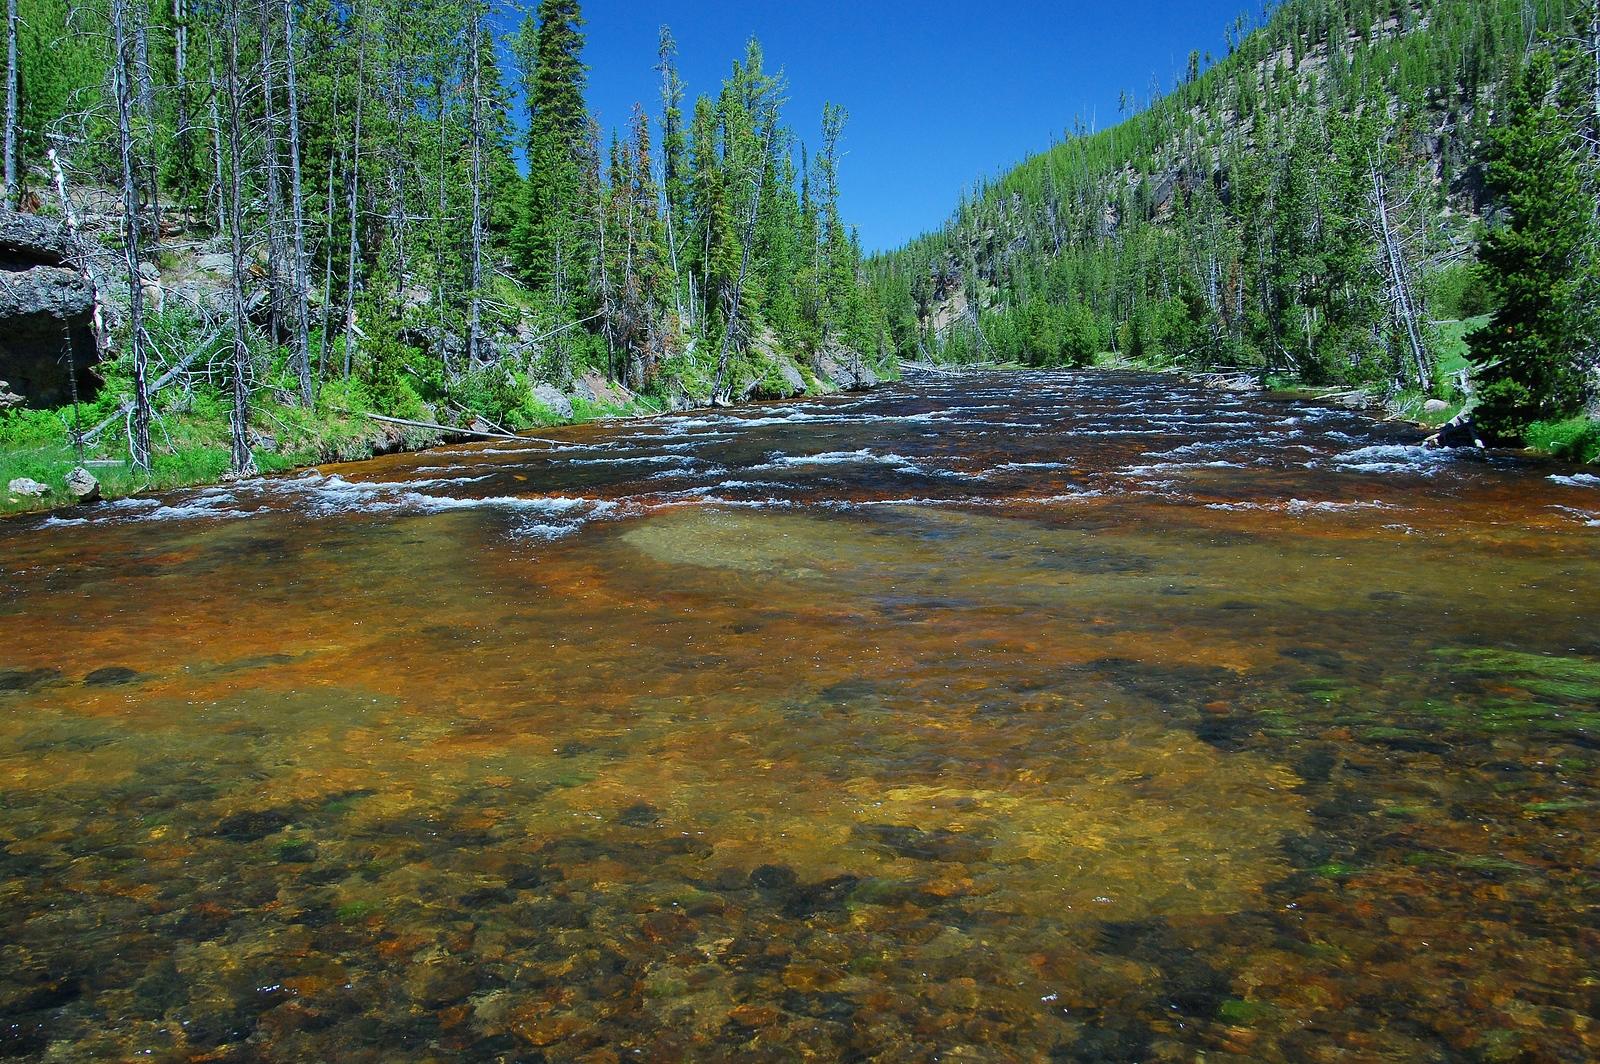 Yellowstone%201%20128-X3.jpg